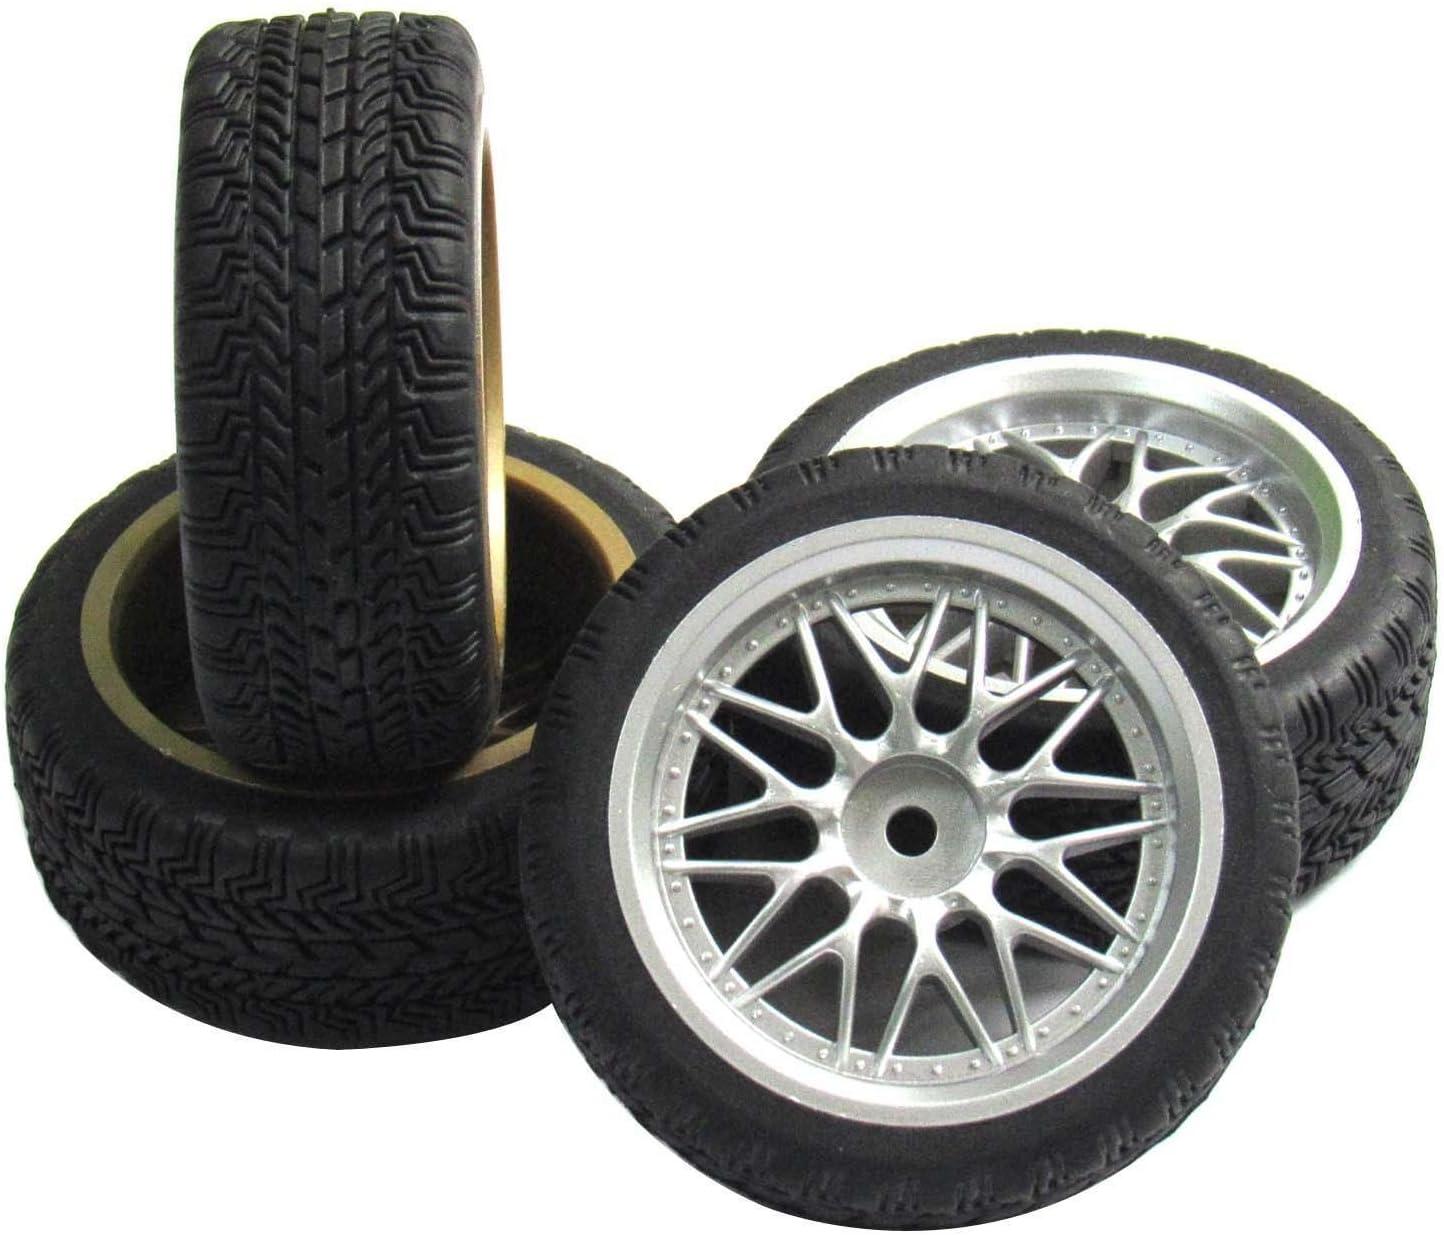 4pcs 12mm Hub Smooth Hard Tires Tyre Black Wheel Rims For RC 1//10 Drift Car